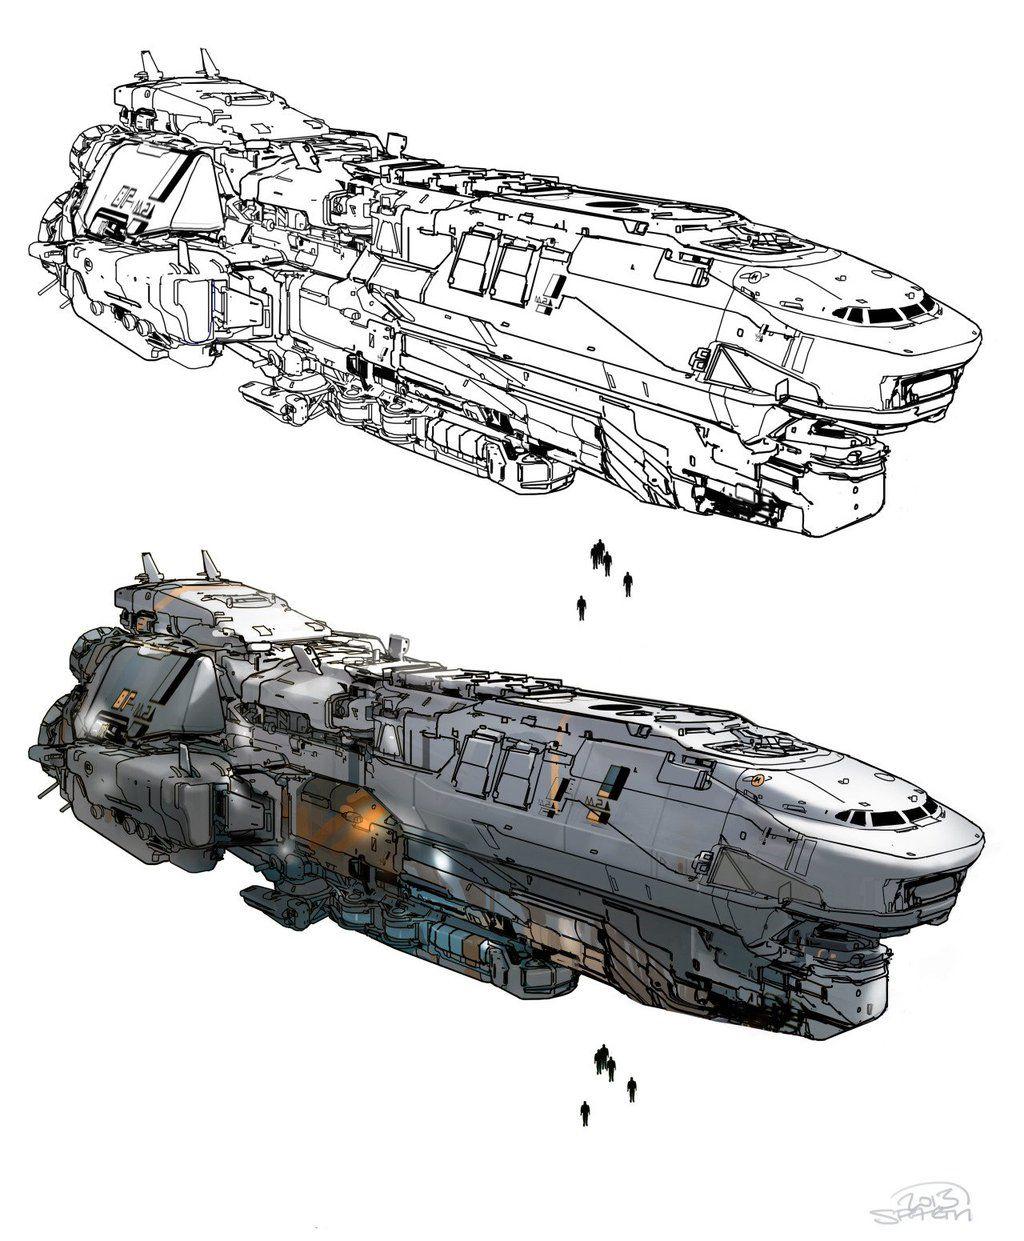 Pin by Kristofer Fox on Futuristic Spaceship art